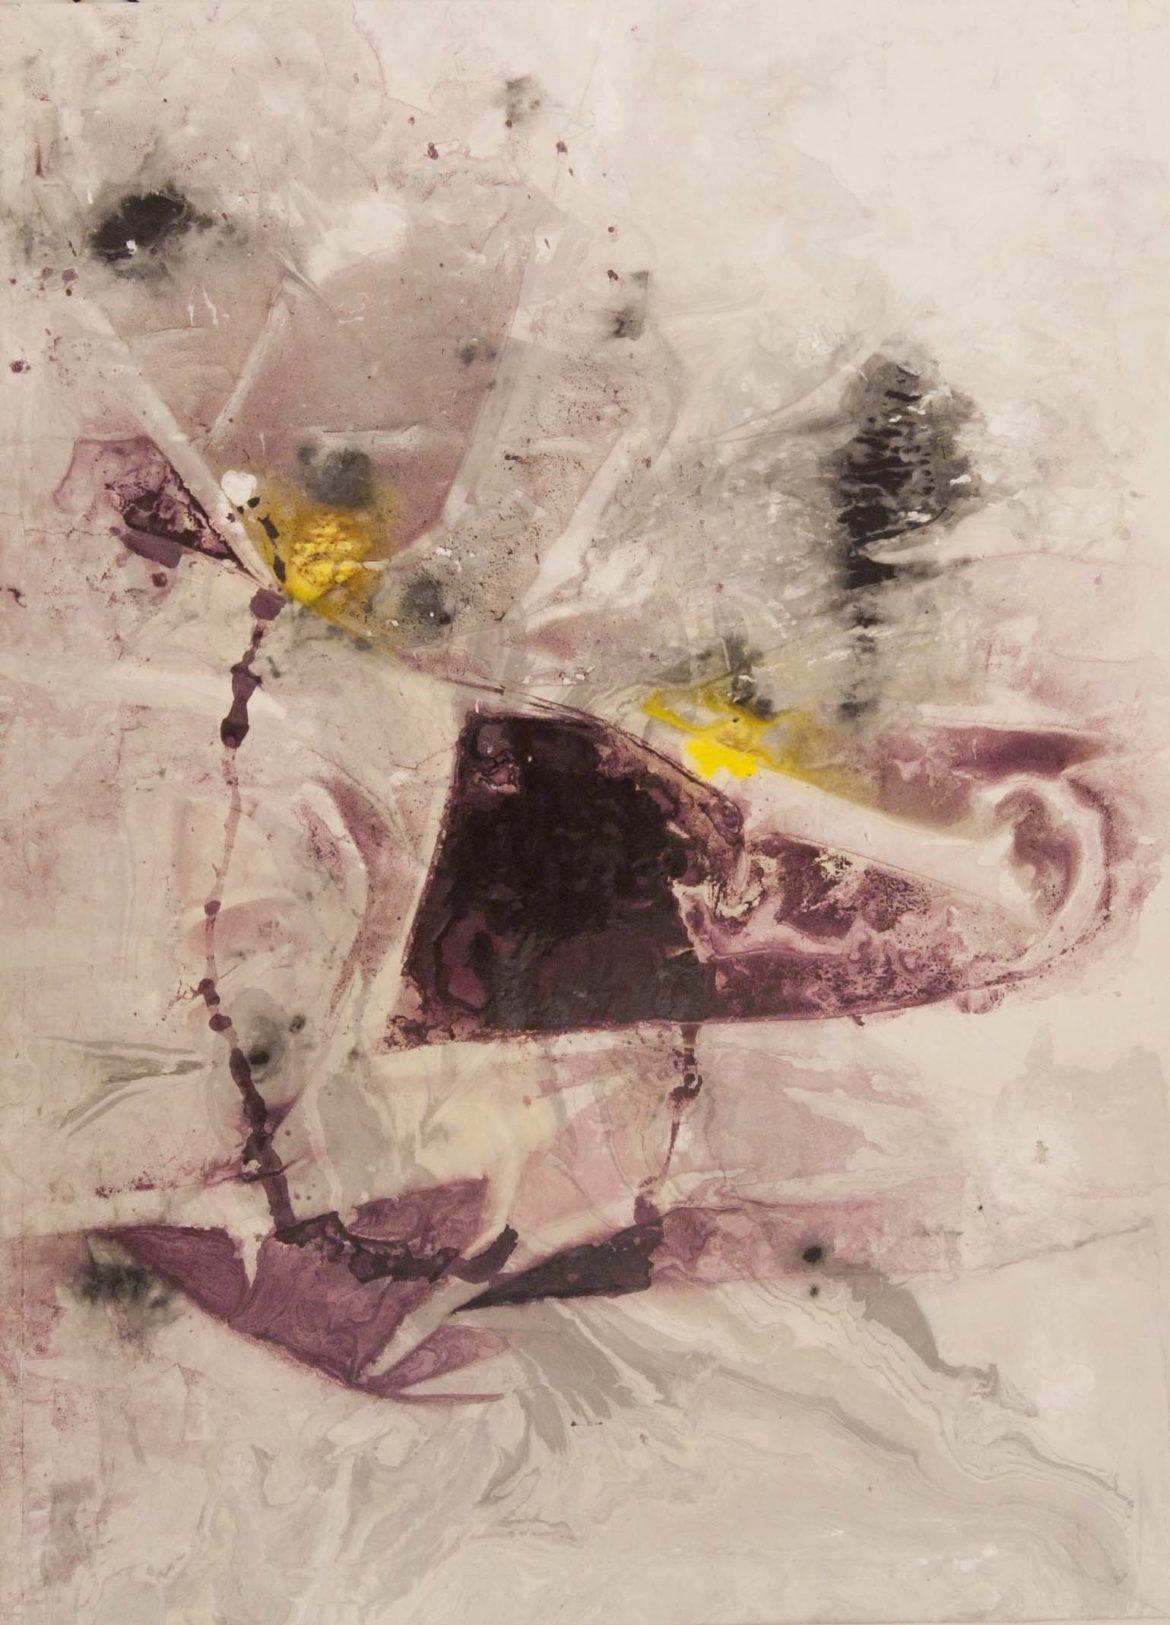 Marinella. Radici-2015.  191x205 cm Tecnica mista su carta